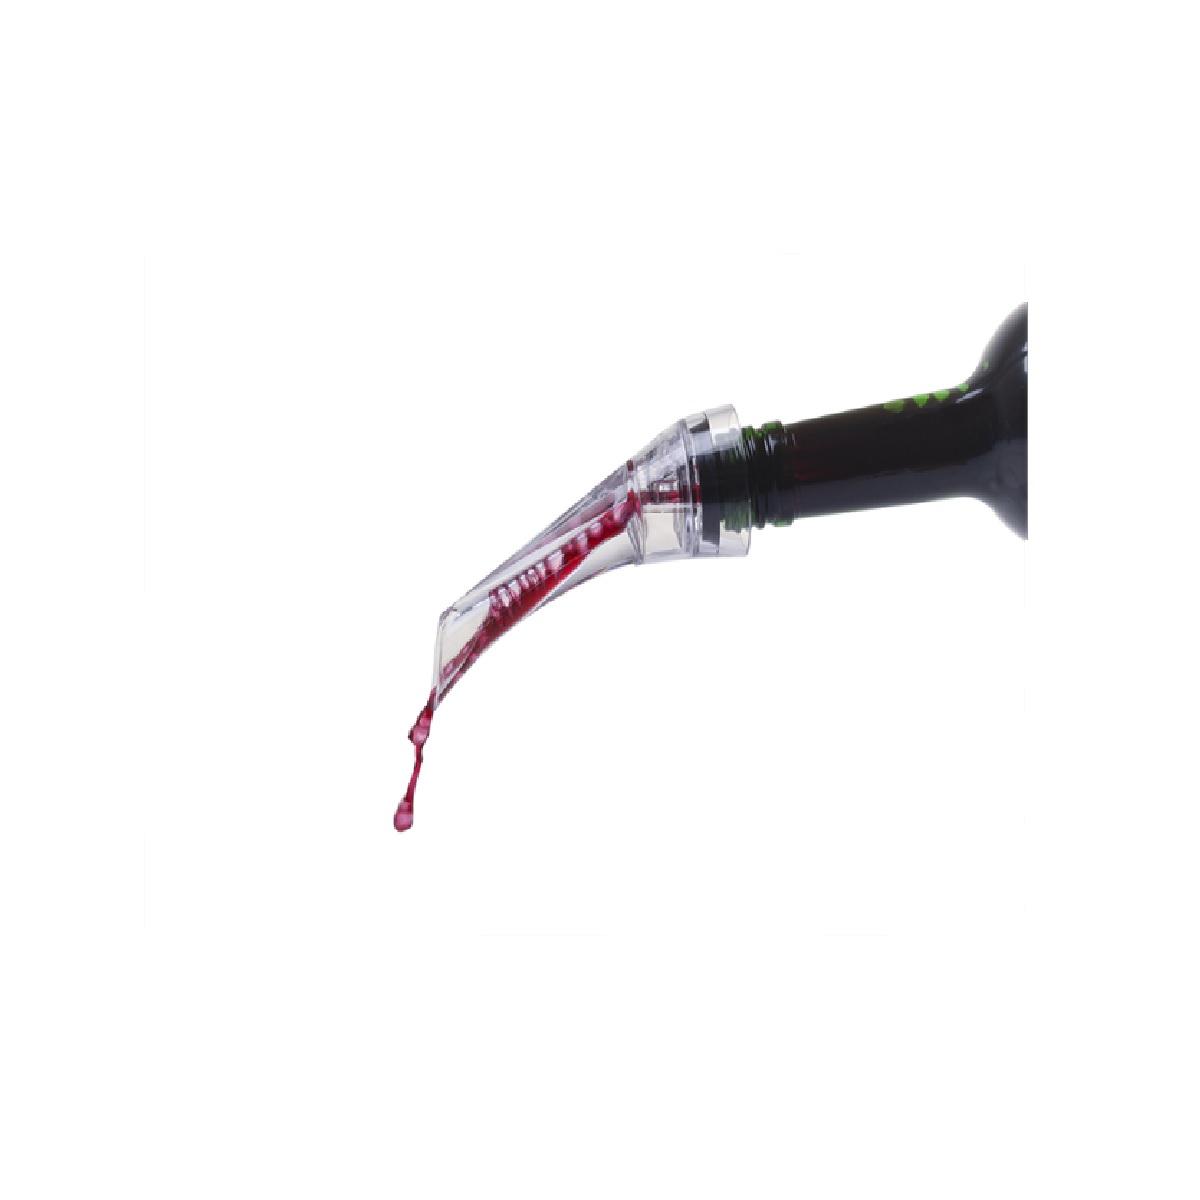 Kit Saca Rolha Aerador Anel Cortador d Lacre para Vinho Brinox